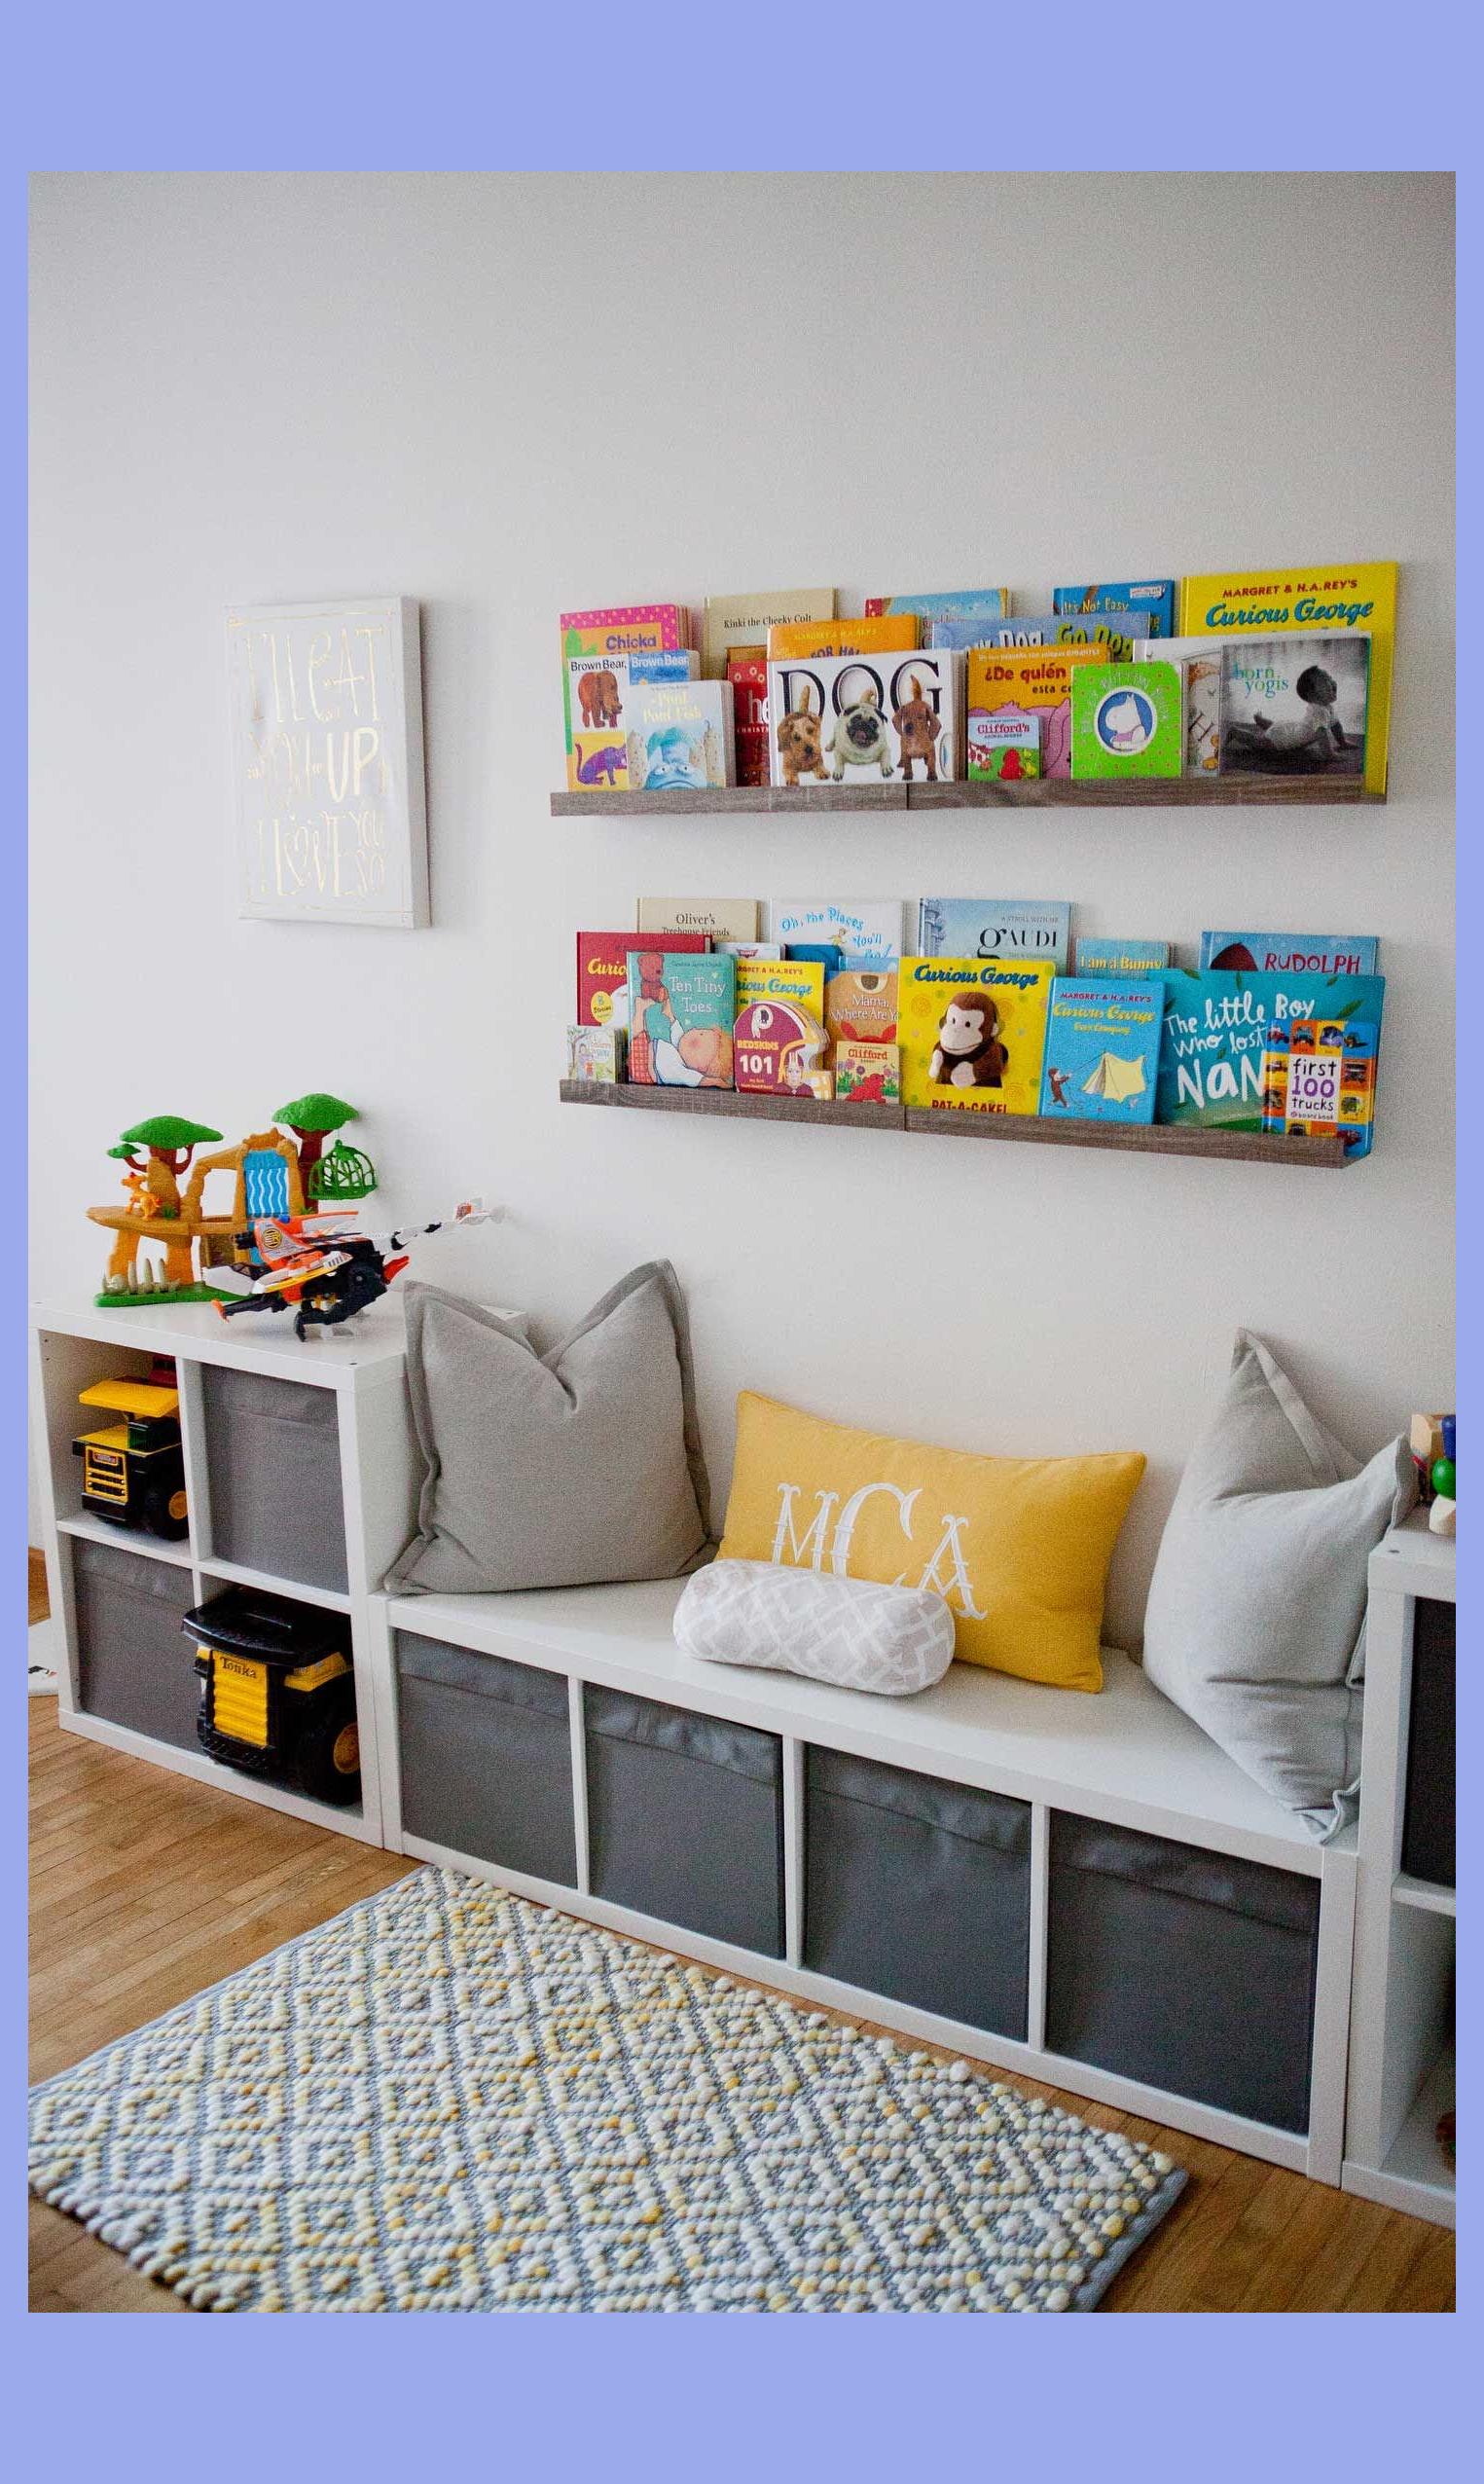 Pinterest In 2020 Storage Kids Room Small Kids Room Ikea Kids Playroom